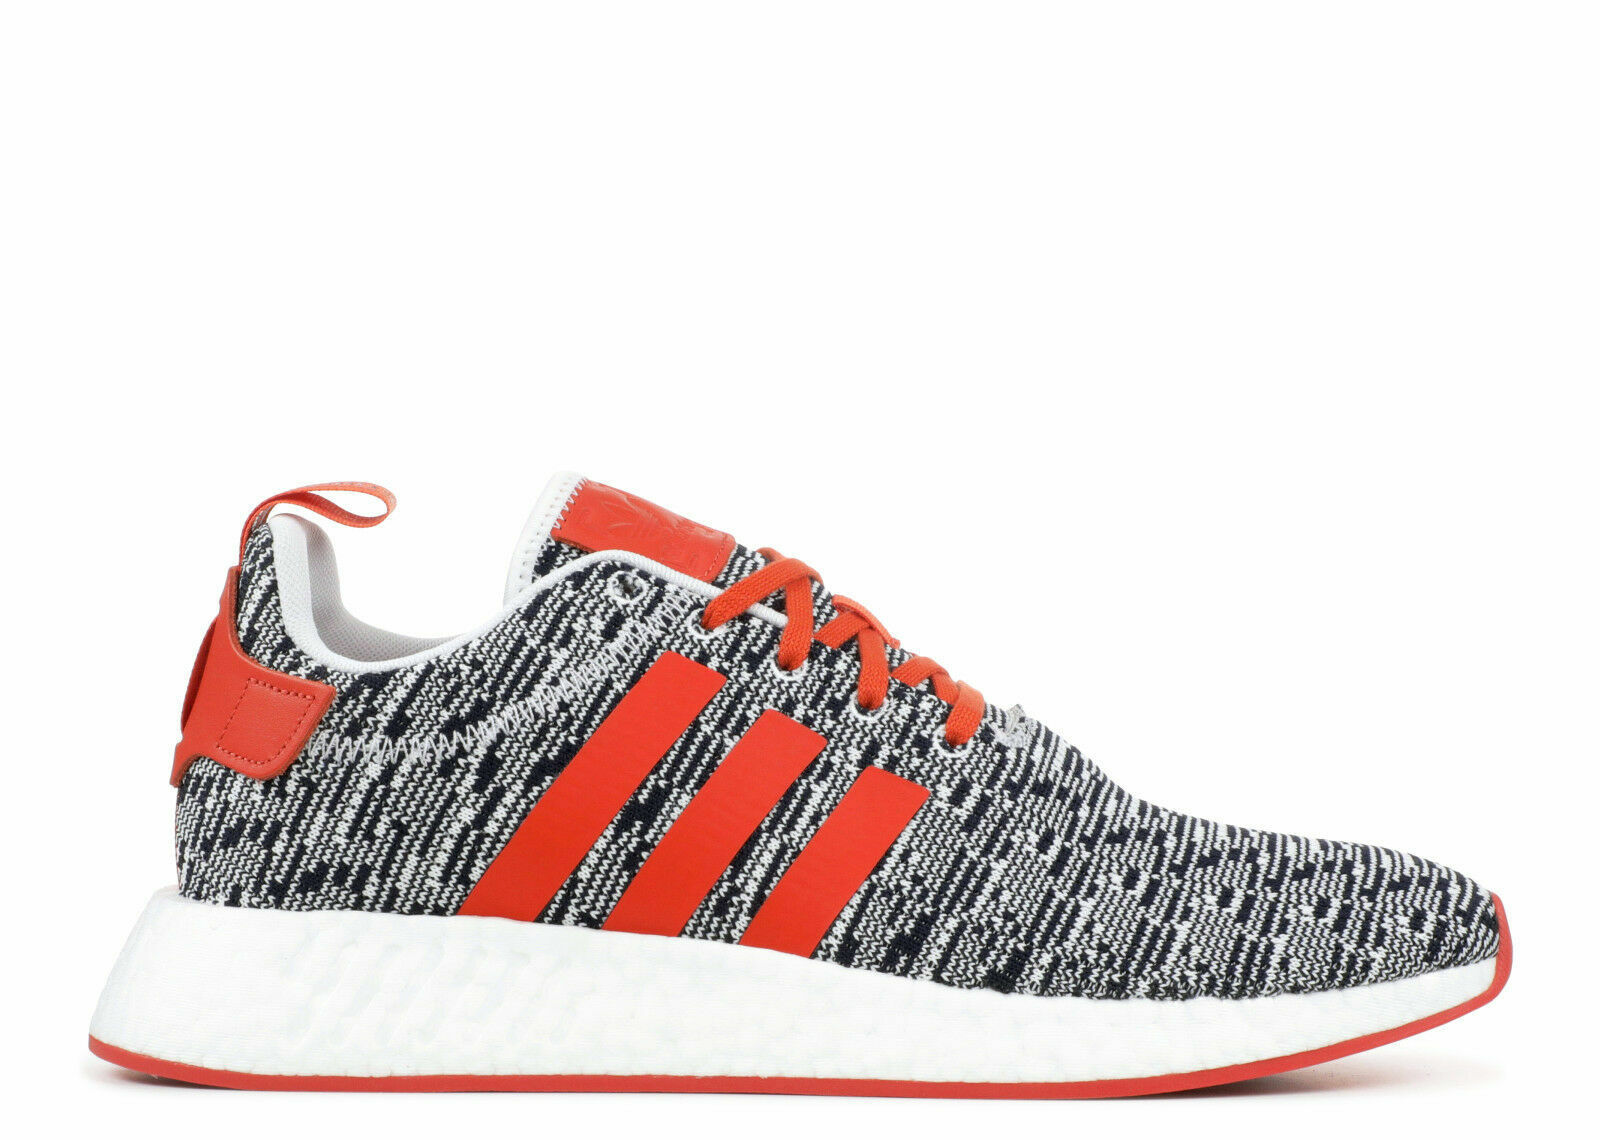 Adidas Originals NMD R2 Solar Red Legend Ink Running shoe sneaker CQ0720